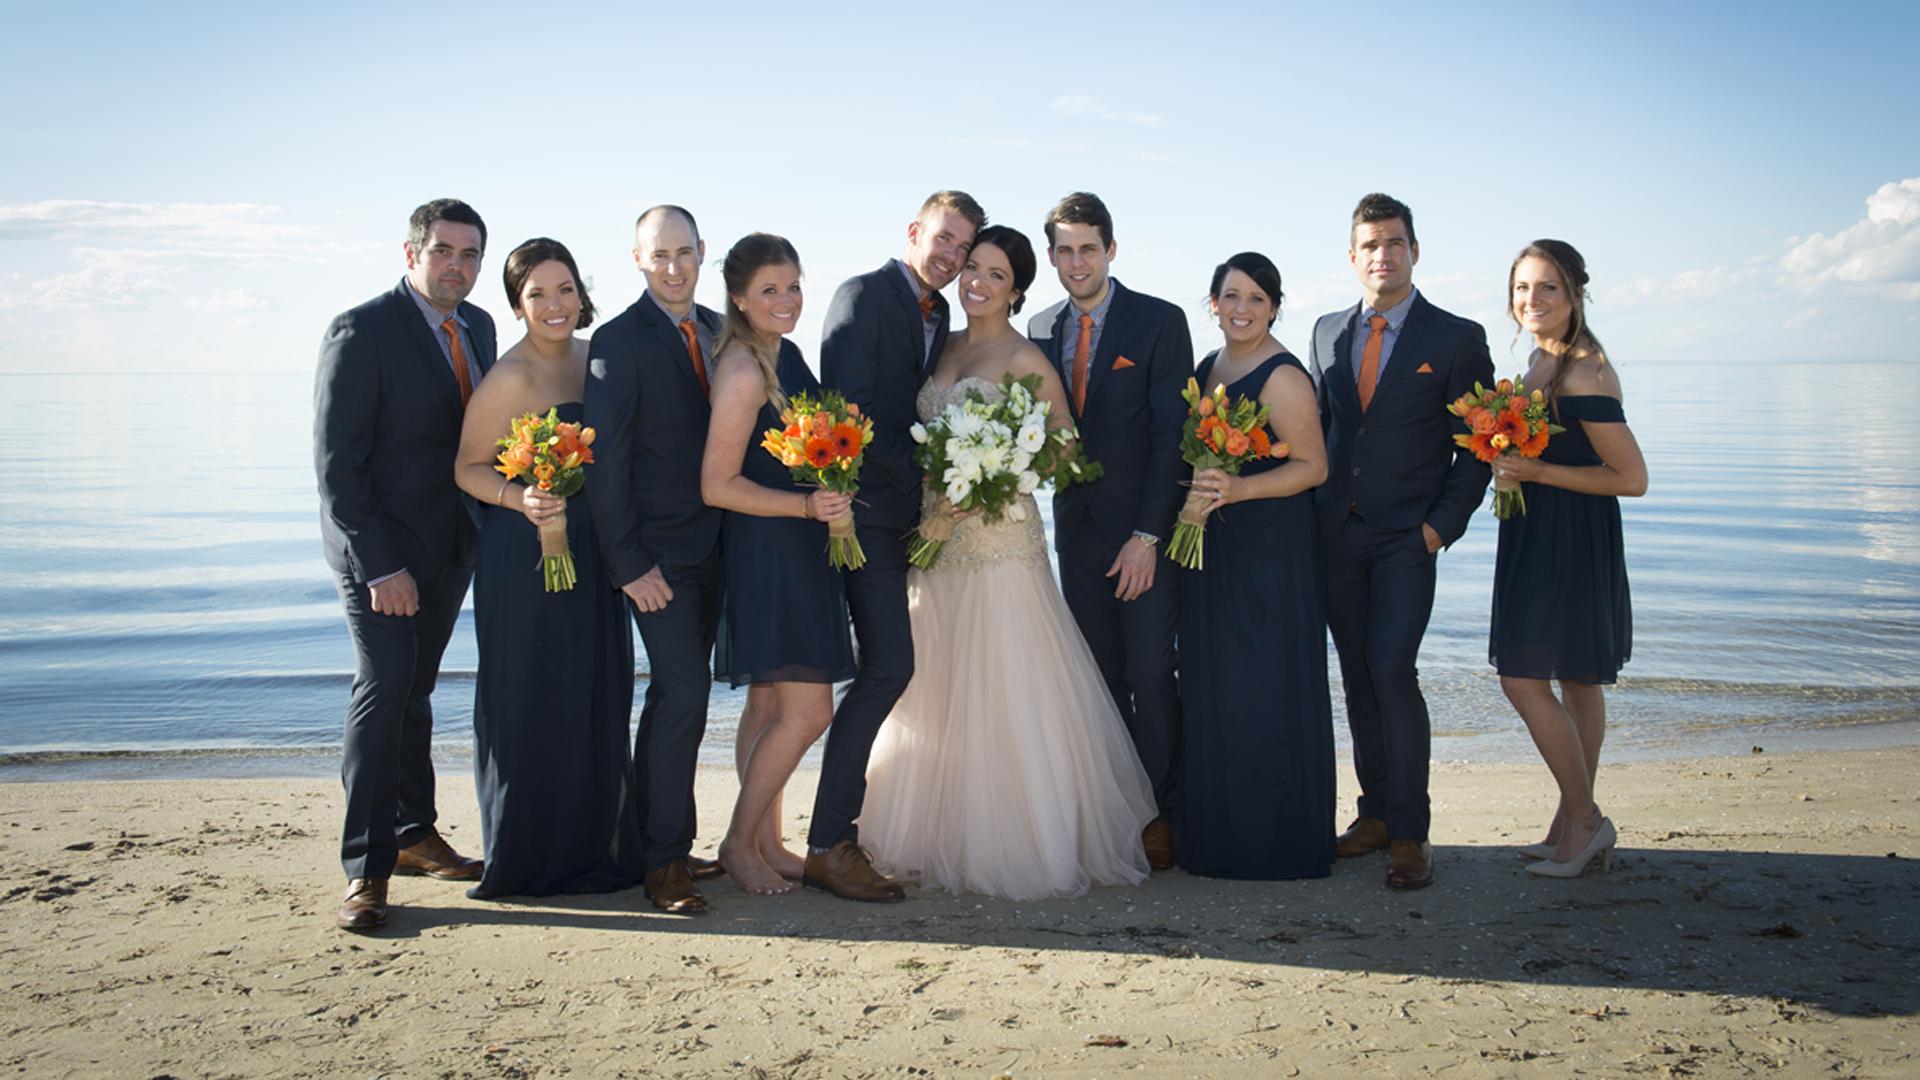 bridal party wedding photo at Sorrento Beach